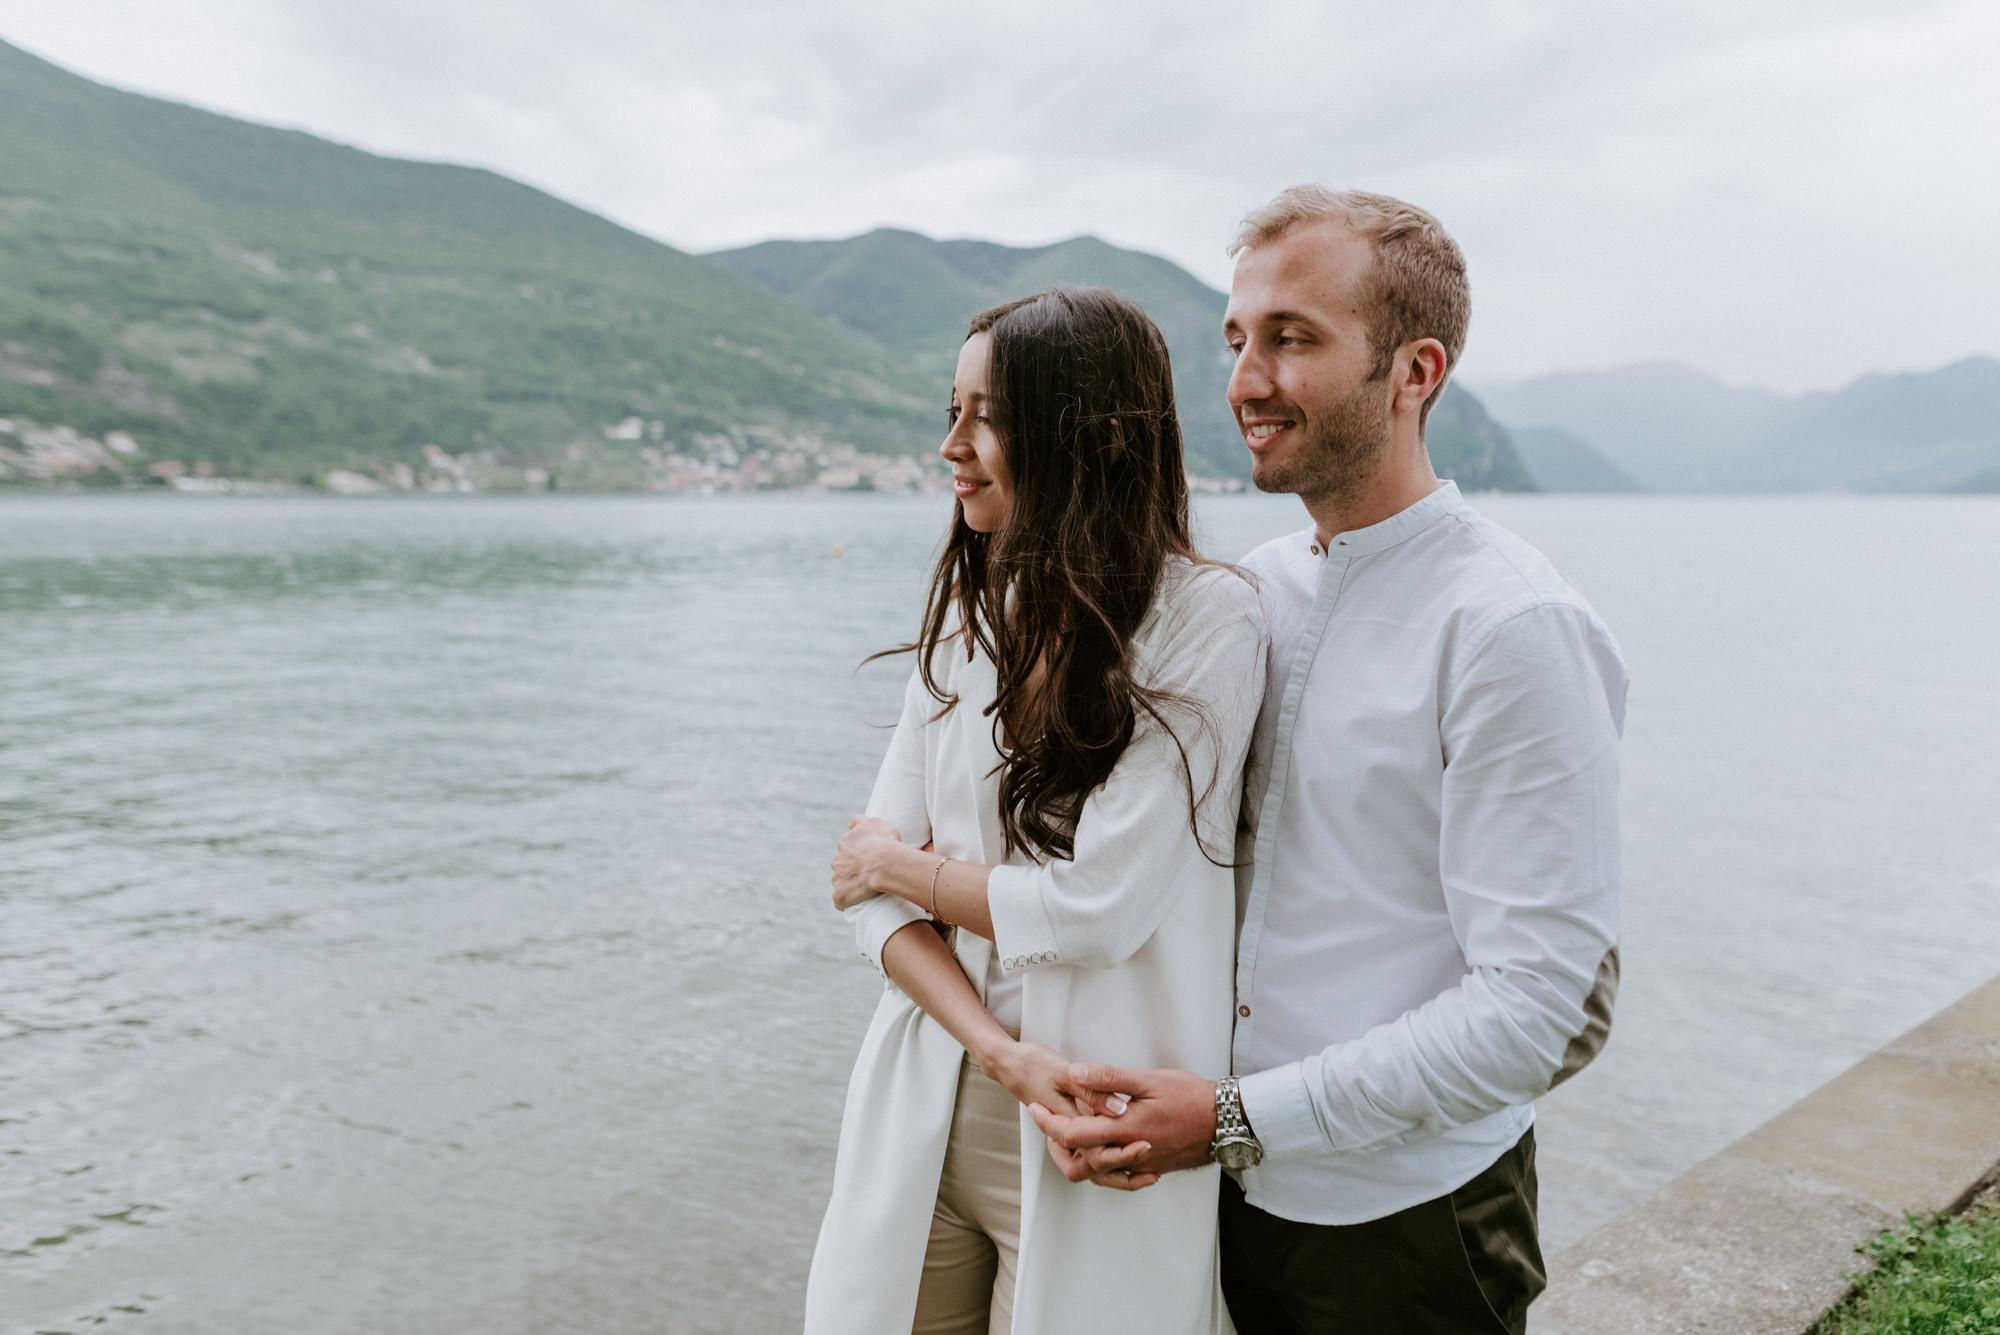 FOTO+PHOTO+BODA+WEDDING+ITALIA+ITALY+MAURICIO+GARAY+MAURICIOGARAY+WEDDINPHOTOGRAPHER+FOTOGRAFODEBODA-2402.jpg